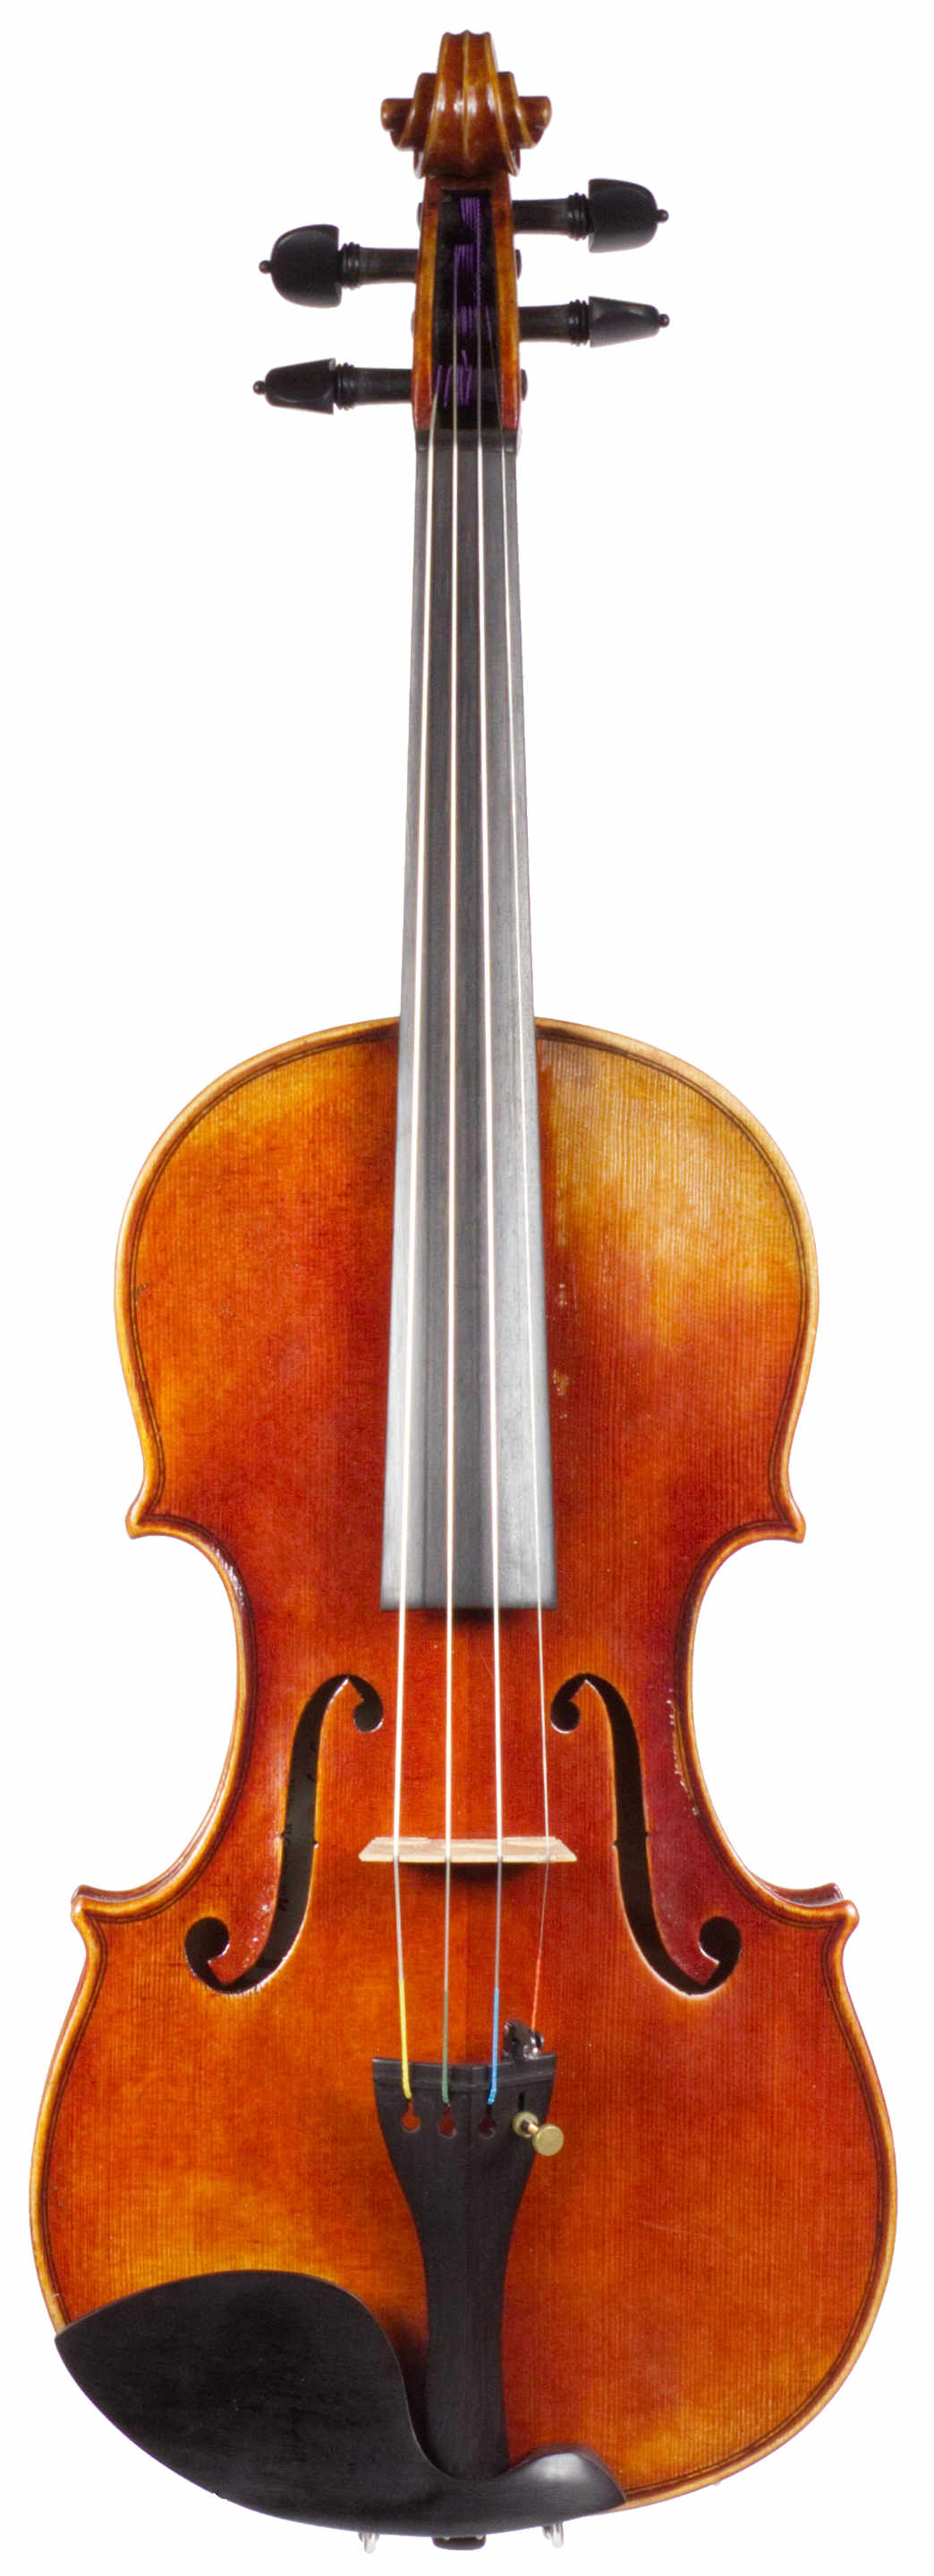 Jay Haide Guarneri violin